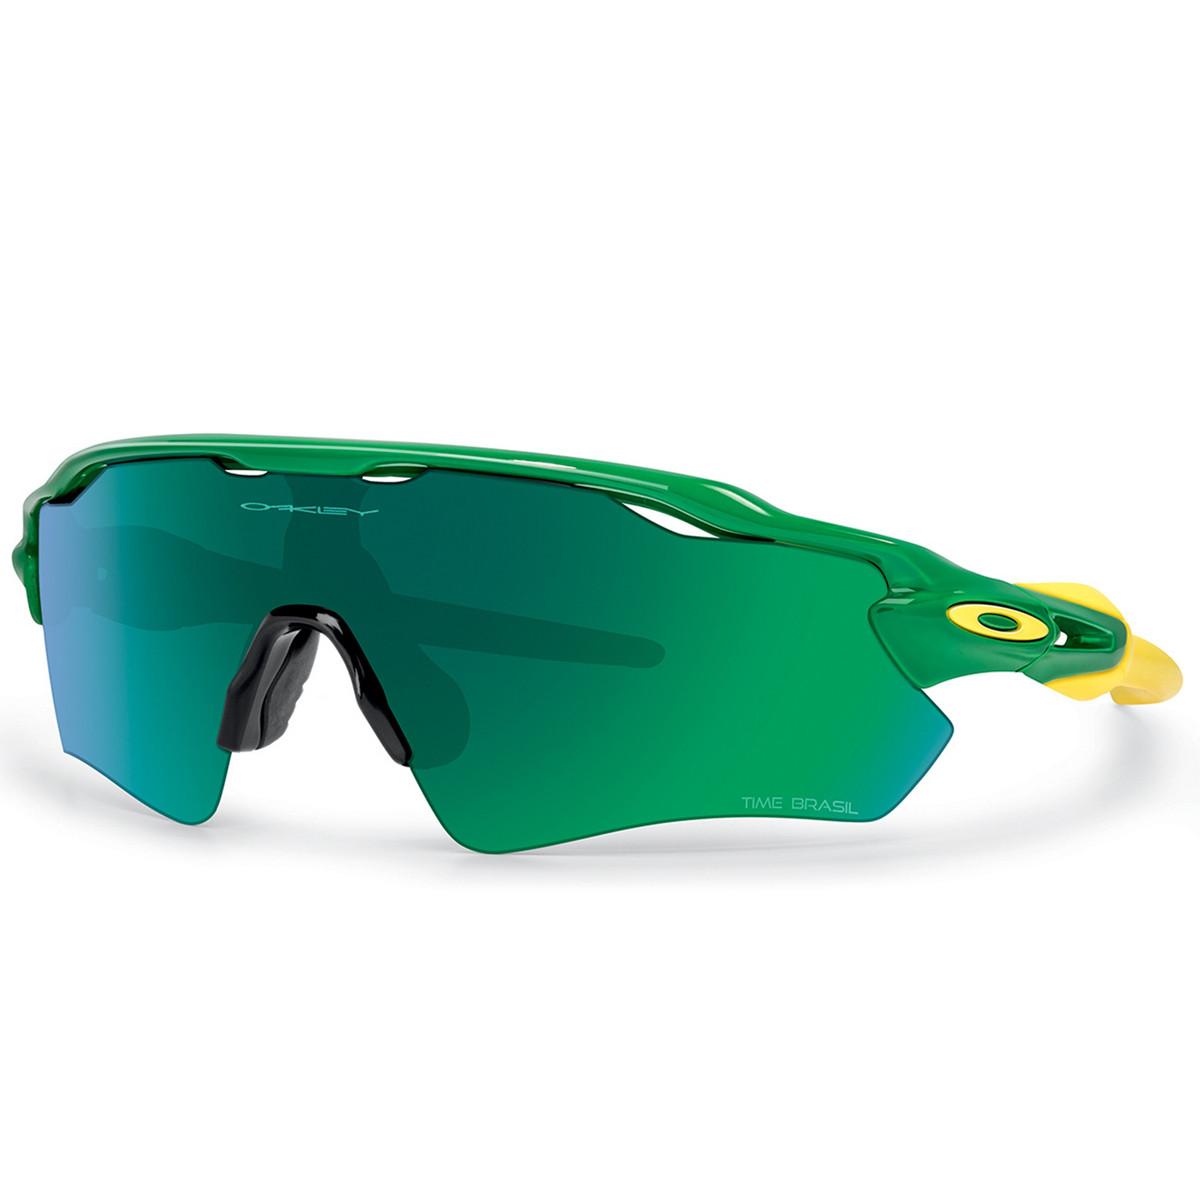 Óculos Oakley Radar EV Path Olimpics Collection Bright Green Lente Jade  Iridium a017d43262